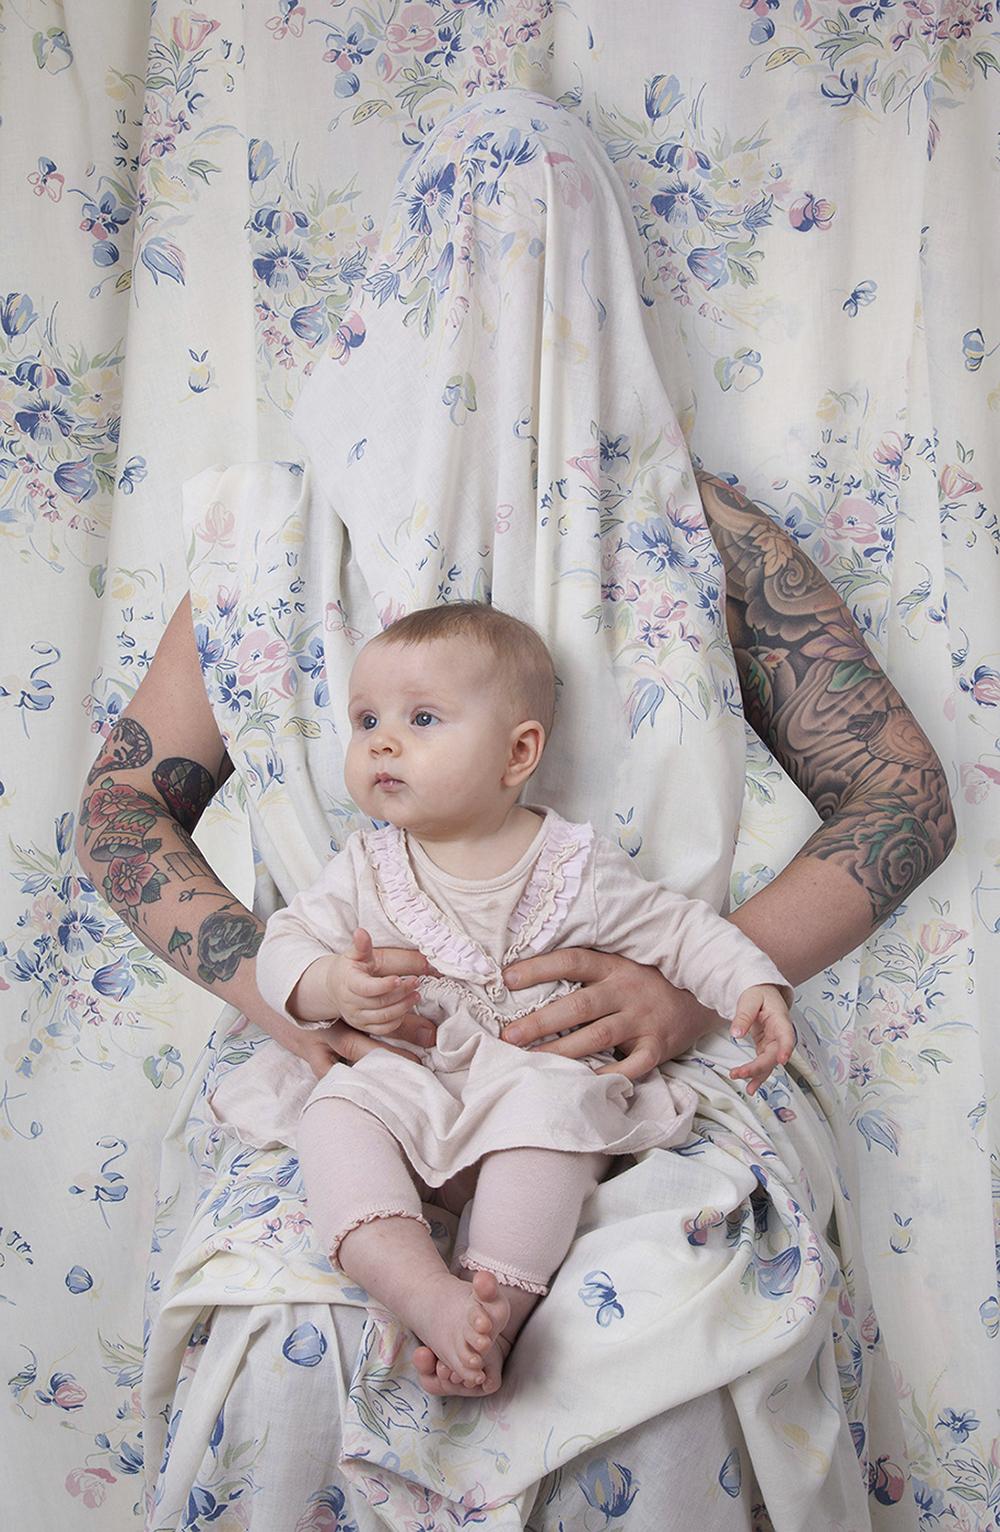 Hidden Mothers: Lisa E , Archival Pigment Print, 2018 © Megan Jacobs